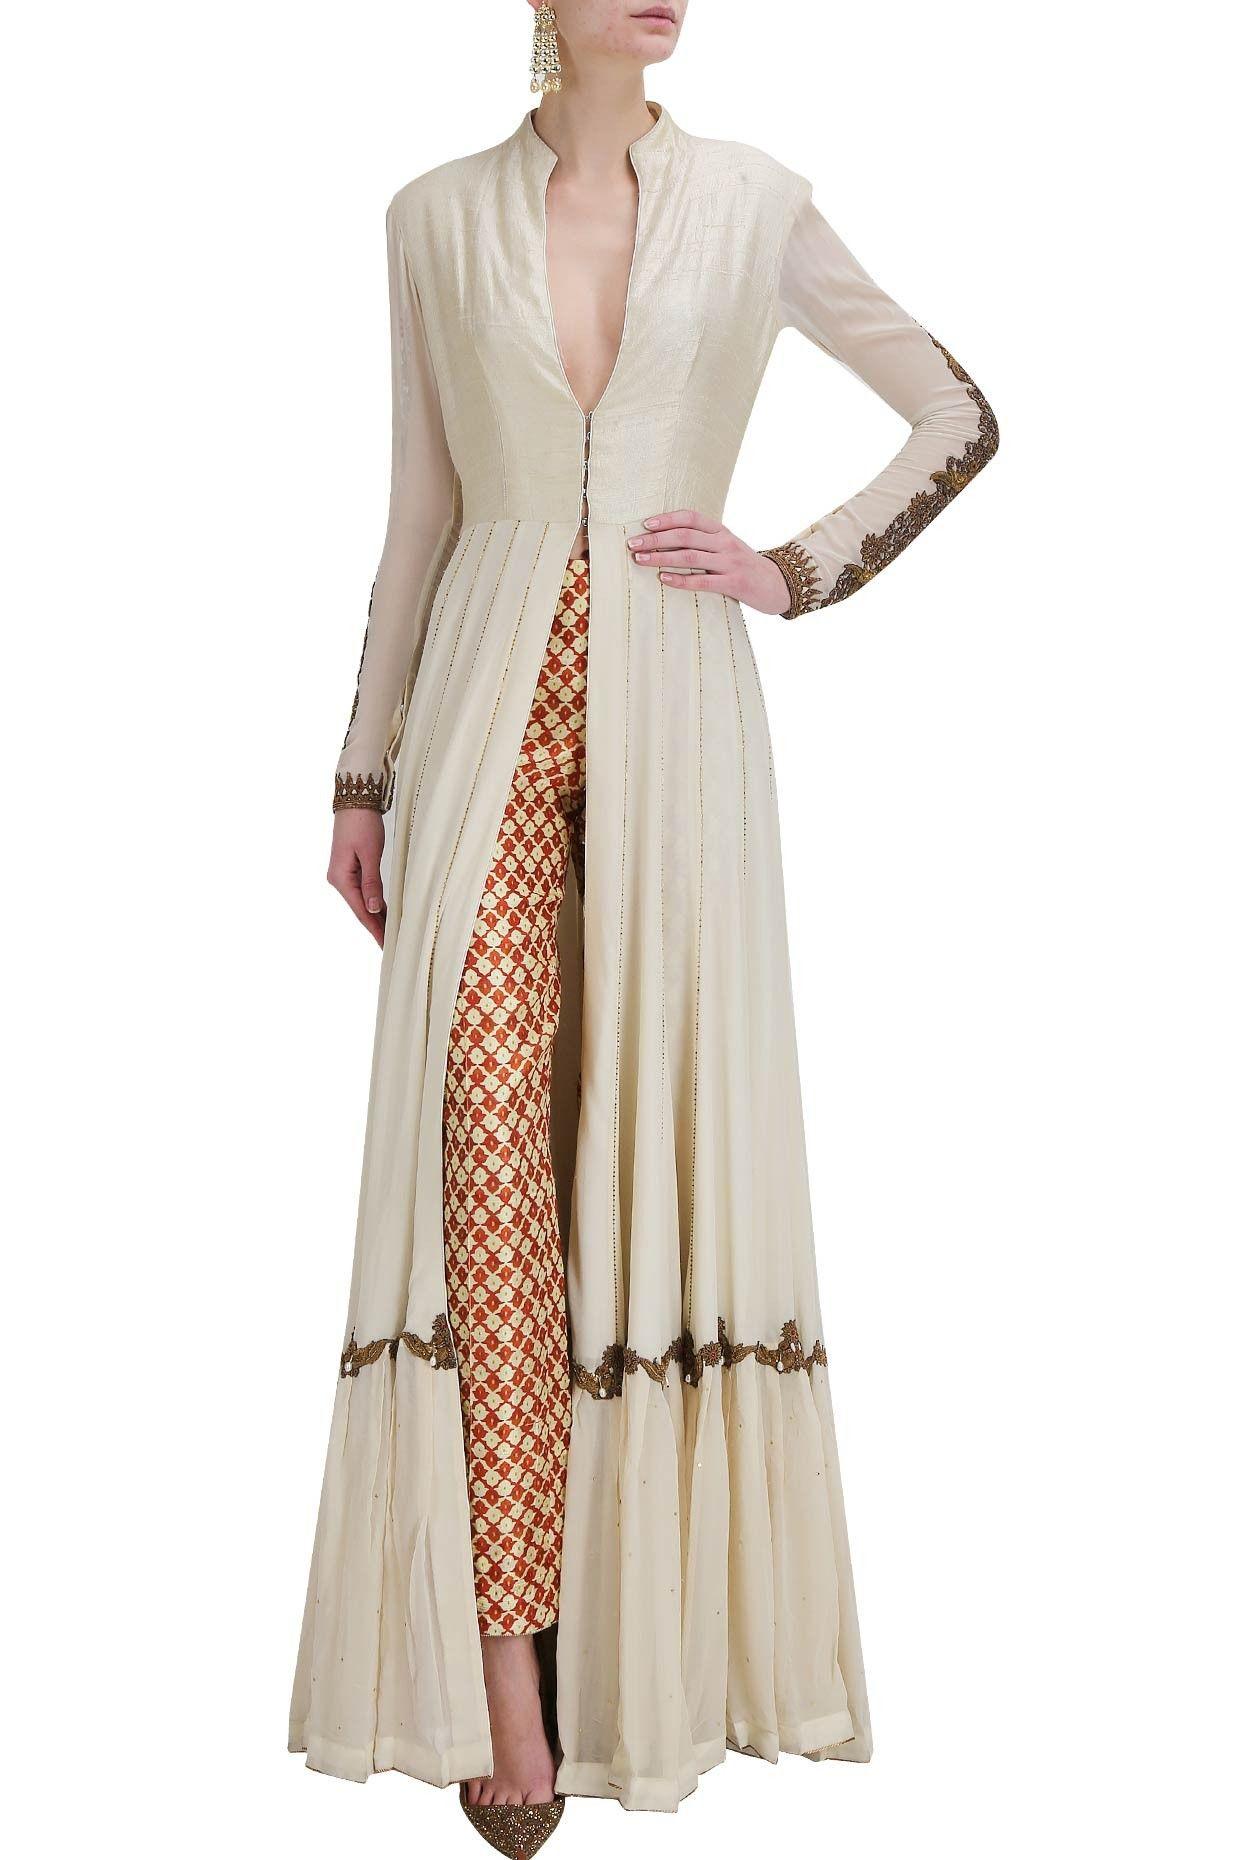 5355e1b27 Moda Femenina · Trajes De Diseñador Indio · Anand Kabra Kimono Largo